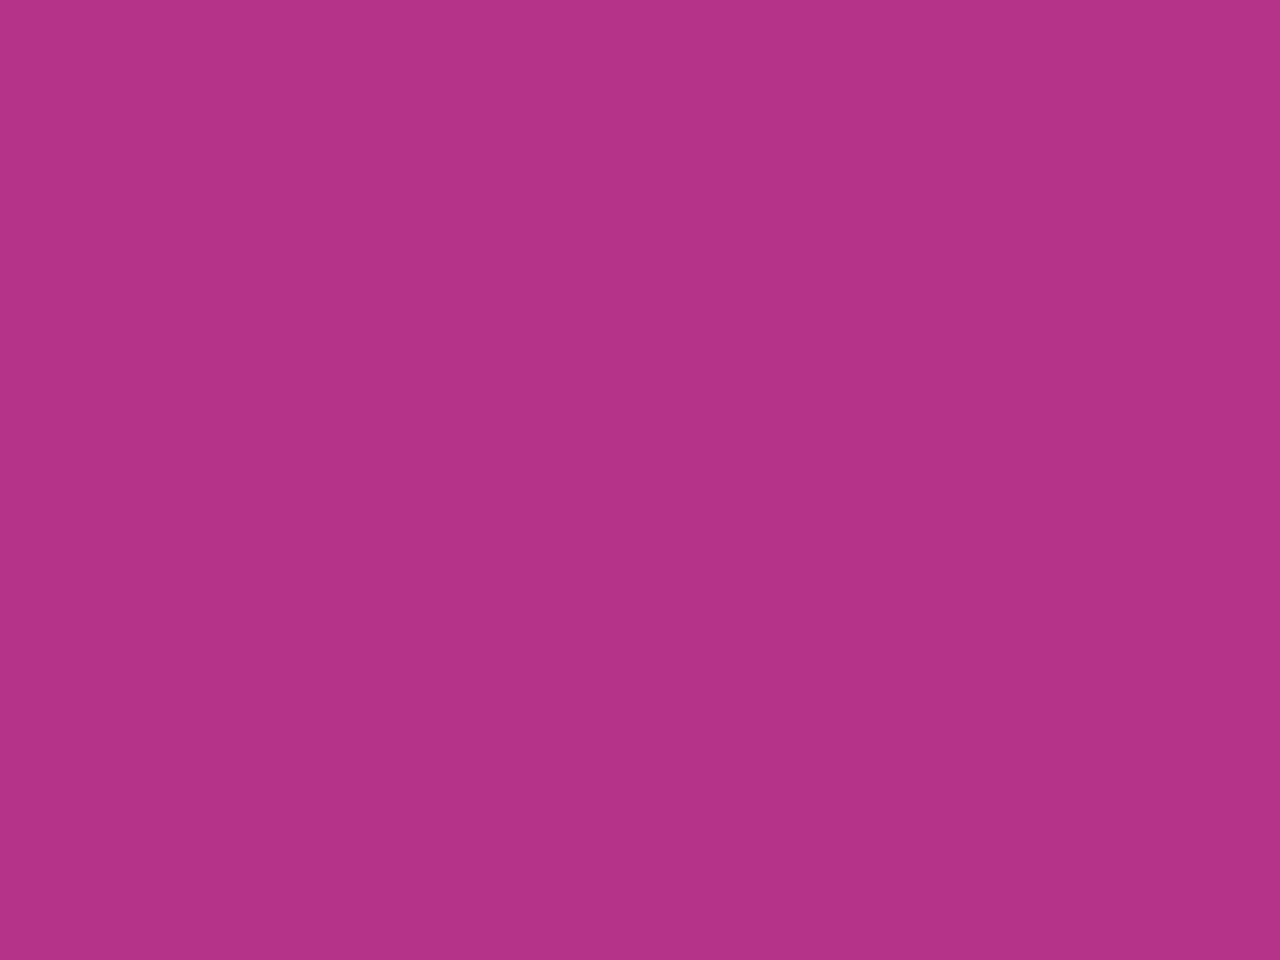 1280x960 Fandango Solid Color Background